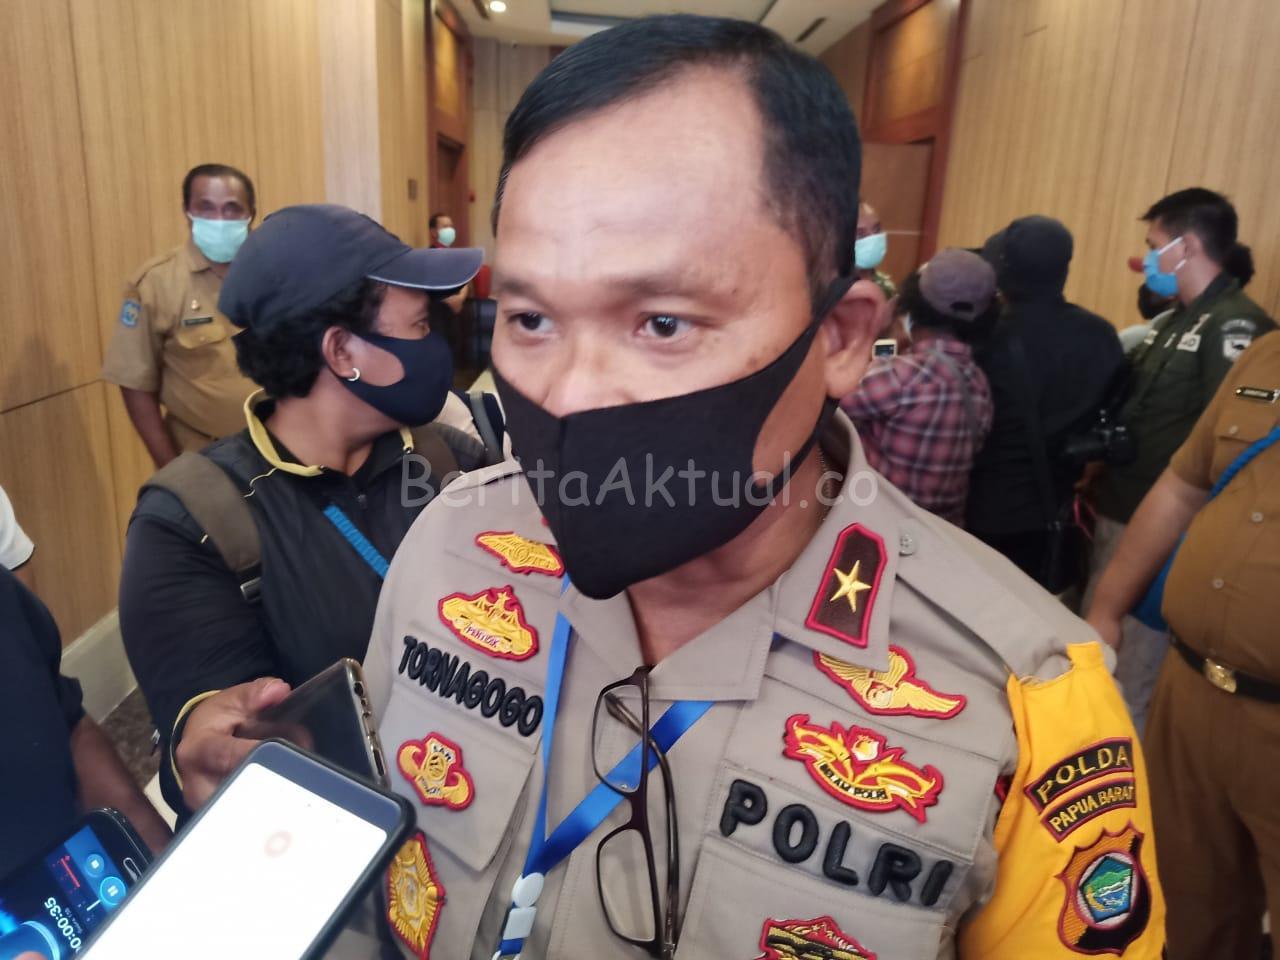 Polda Papua Barat Naik Tipe A, Akan Dipimpin Jenderal Bintang Dua 3 IMG 20200420 WA0055